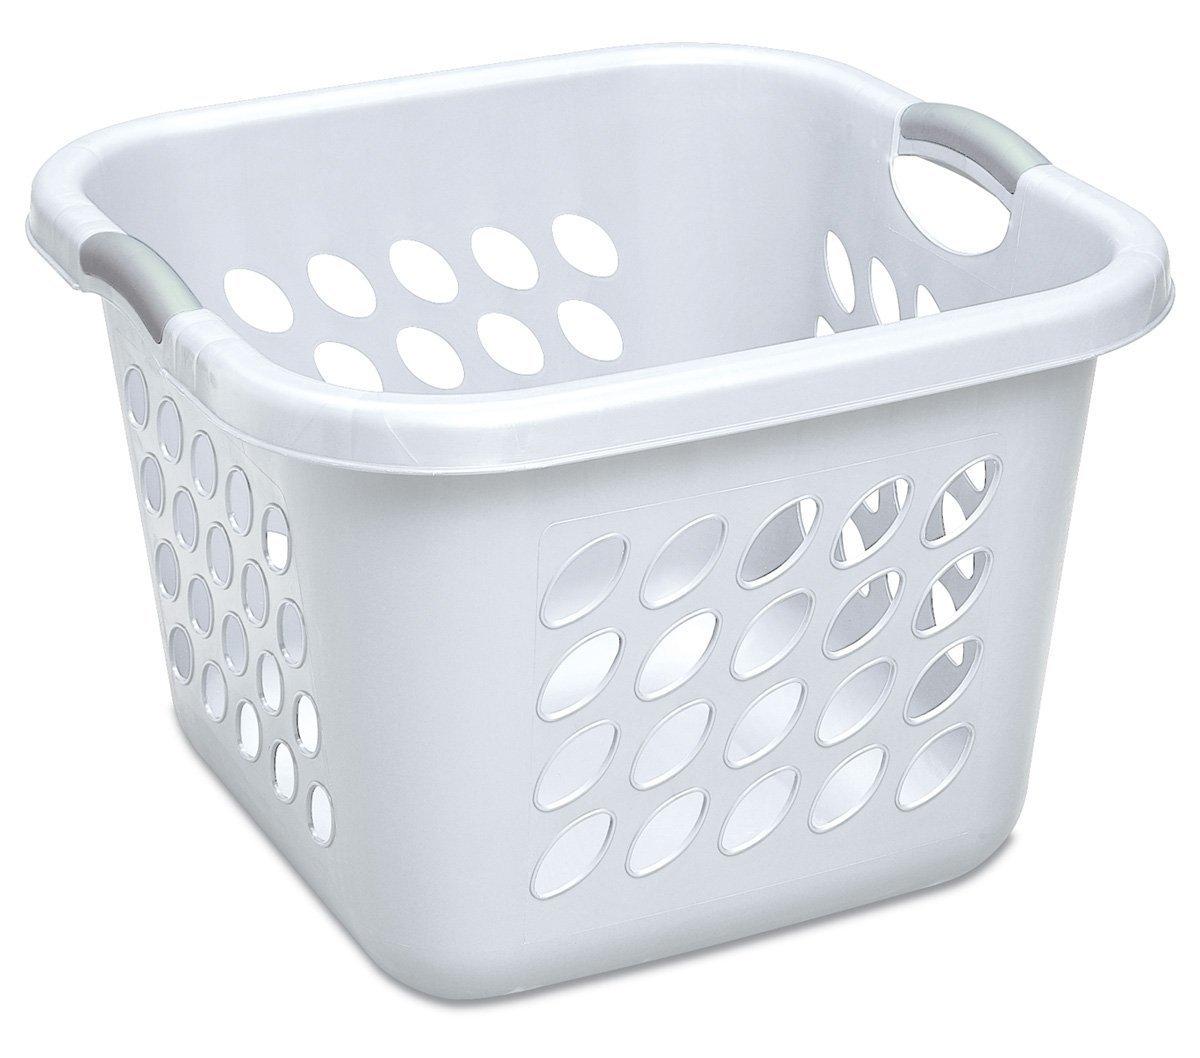 6-Pack of Sterilite 1.5-Bushel Ultra Square Laundry Baskets (White)  $25 + Free Store Pickup